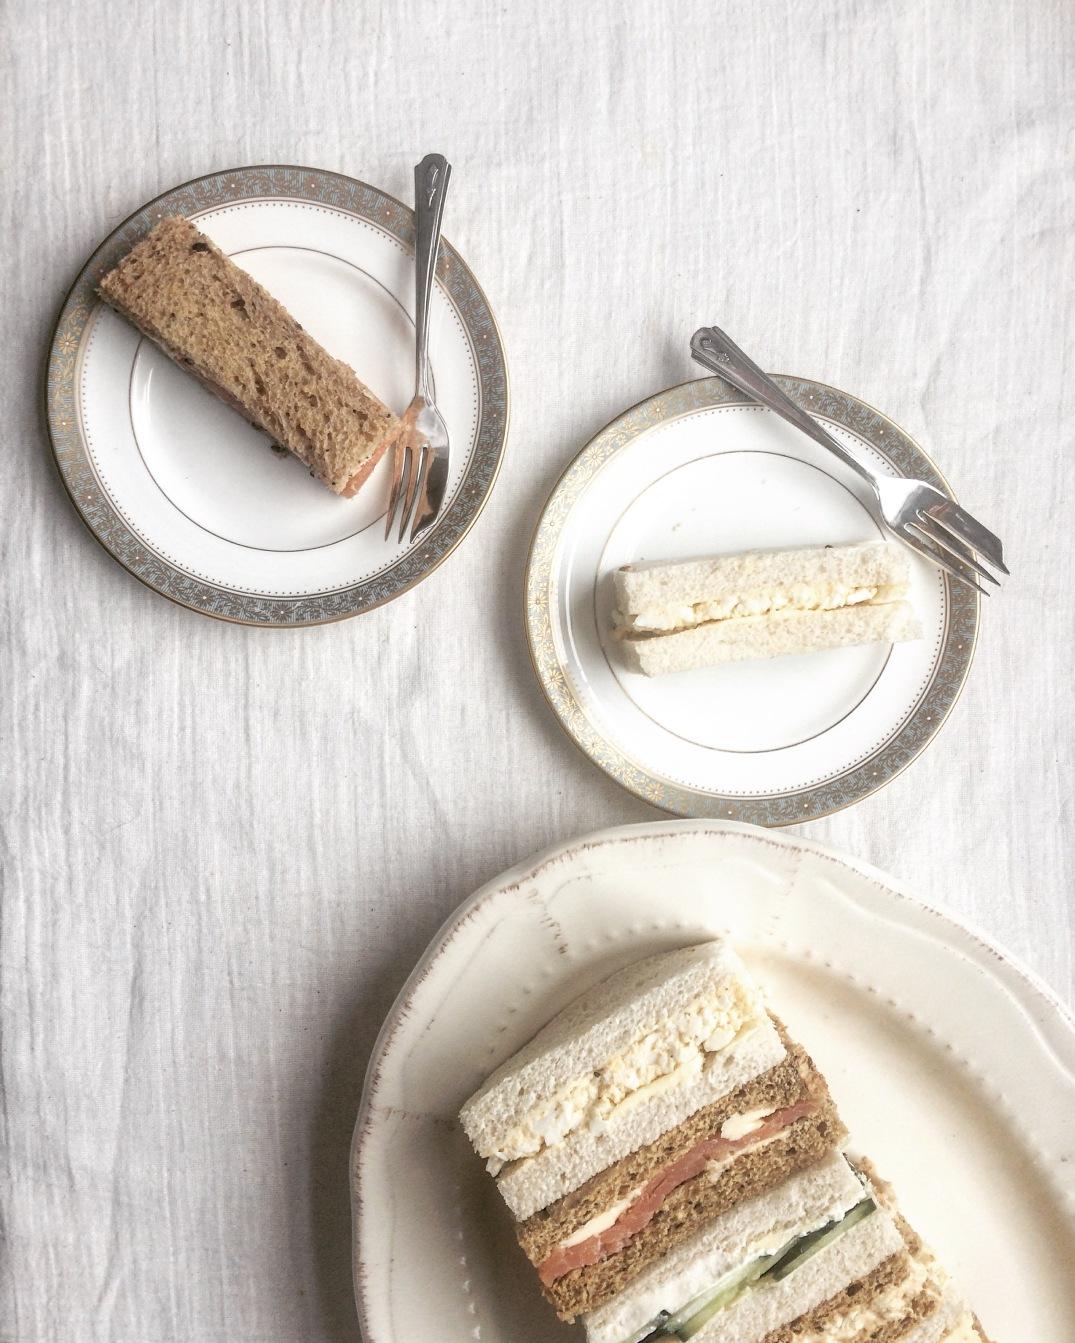 Afternoon Tea Sandwiches - Sky Meadow Bakery blog